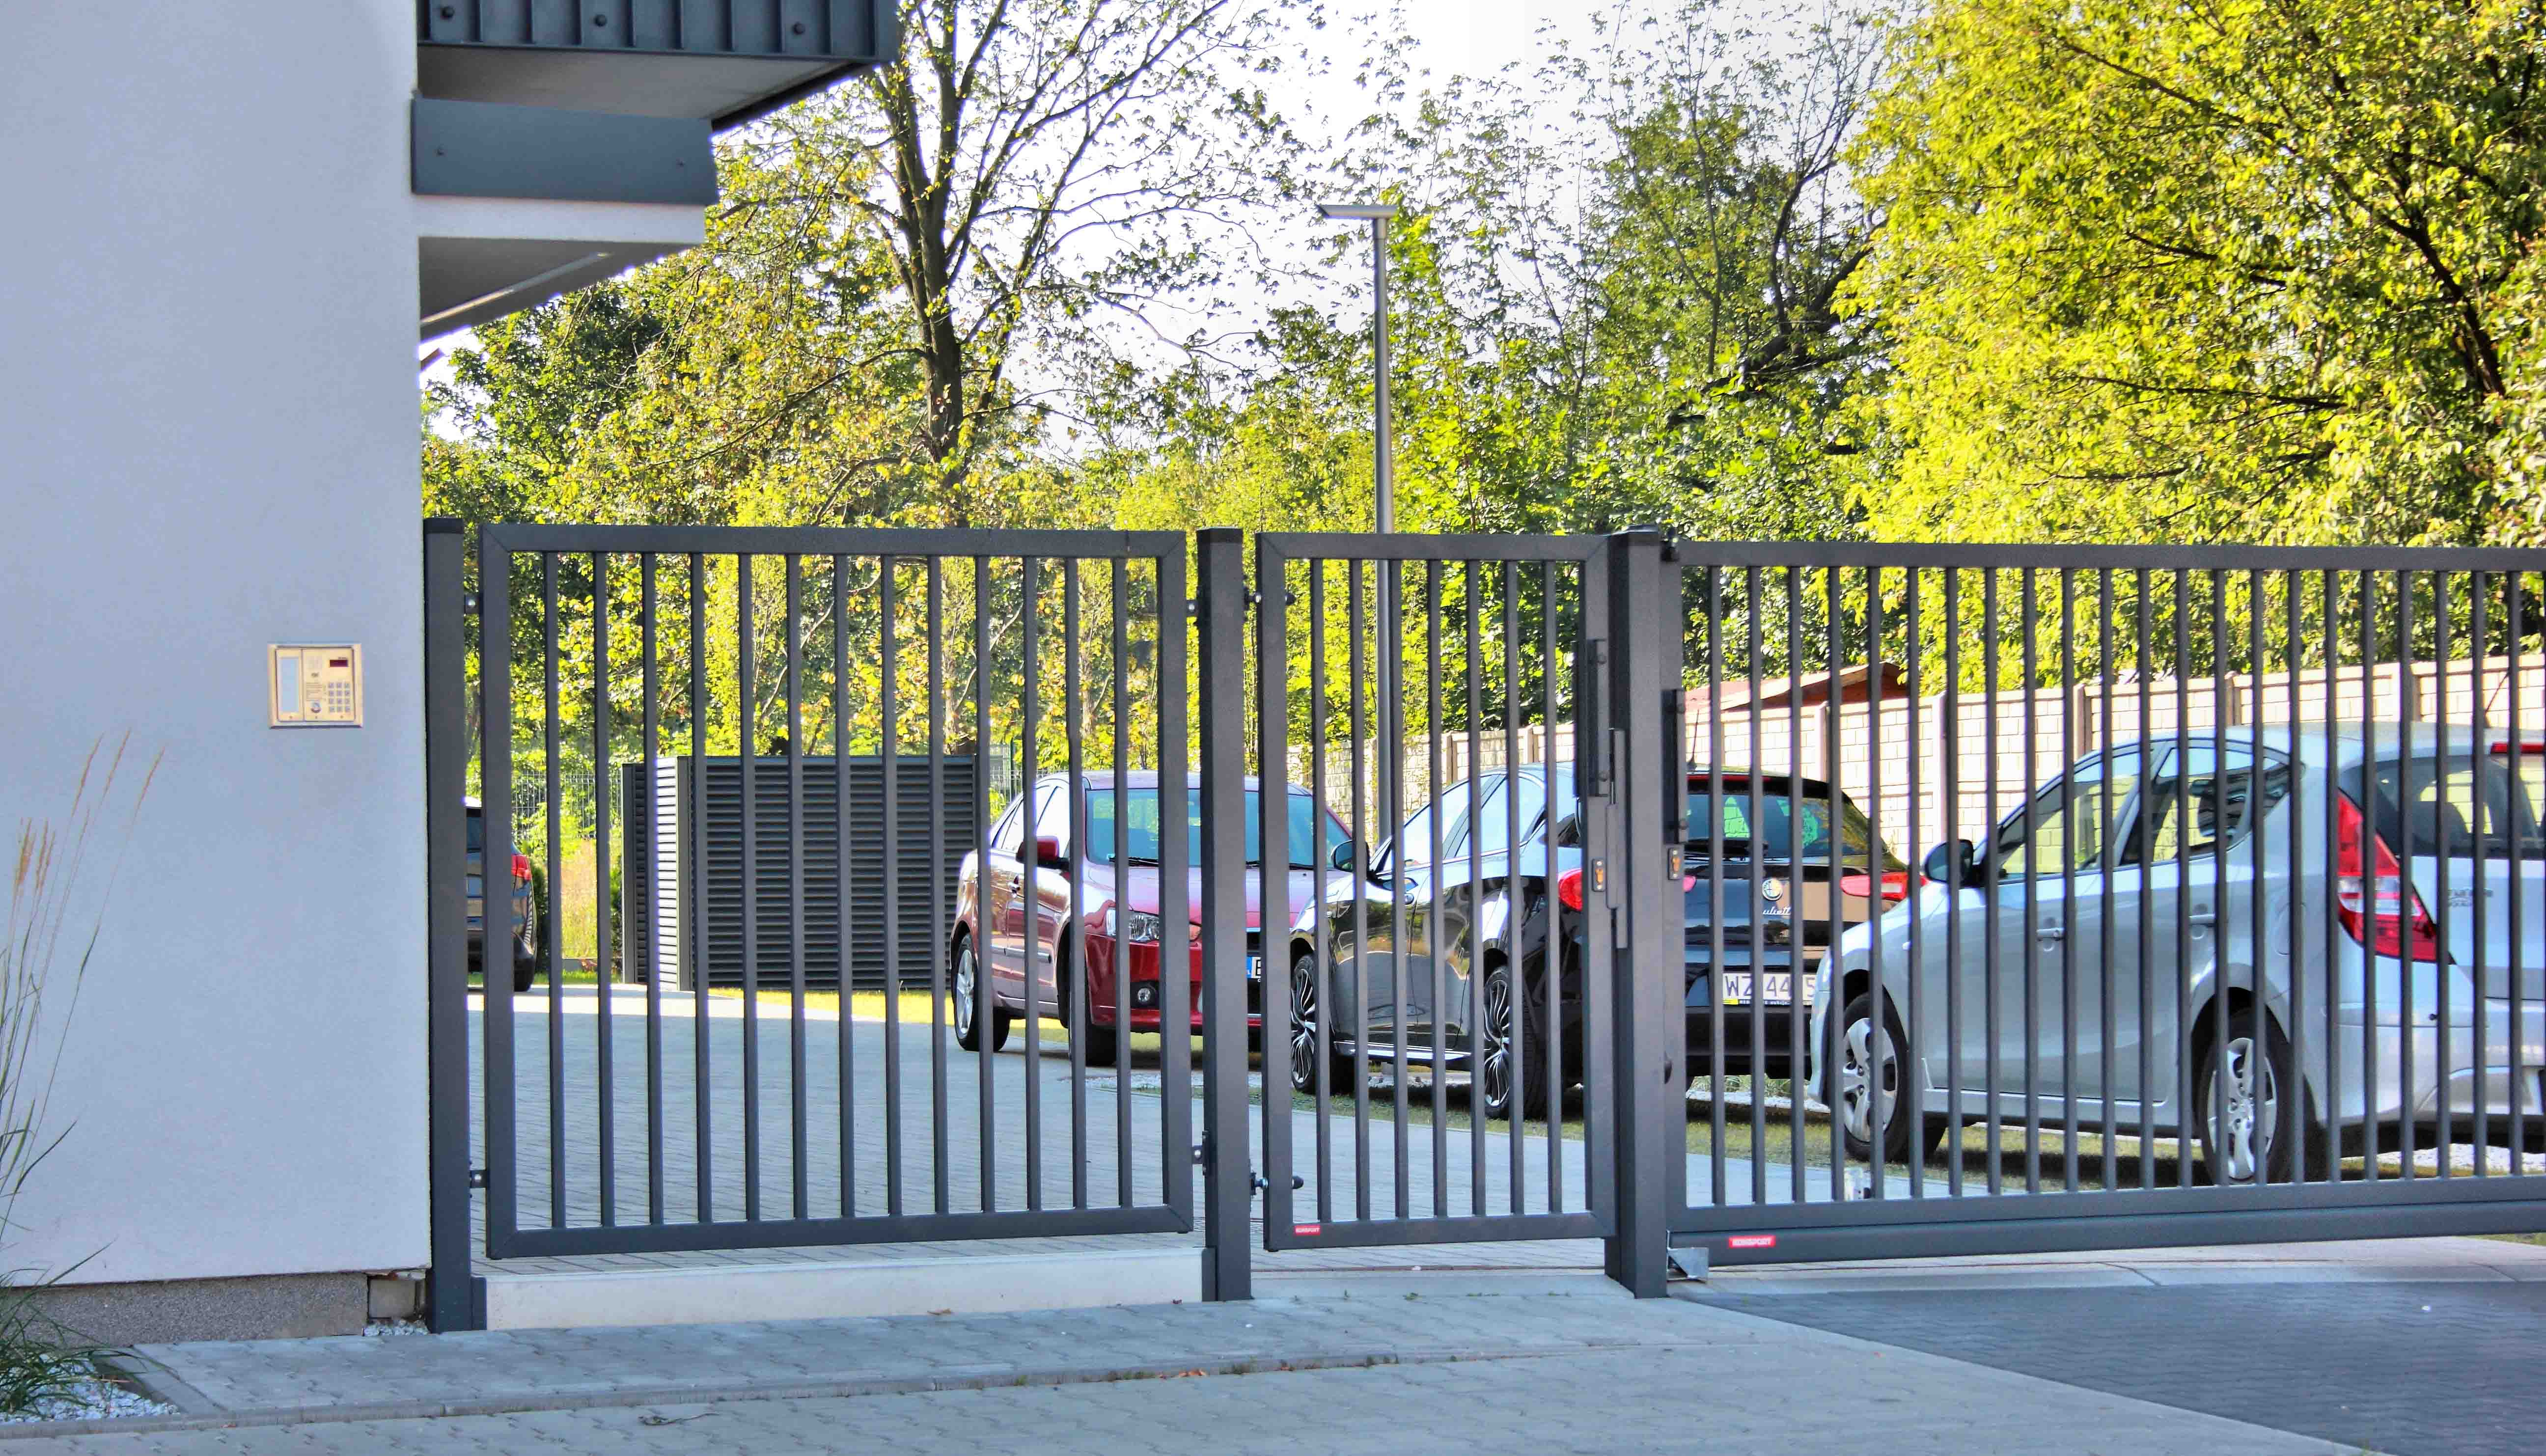 ogrodzenie palisadowe PP002 BORDER KONSPORT